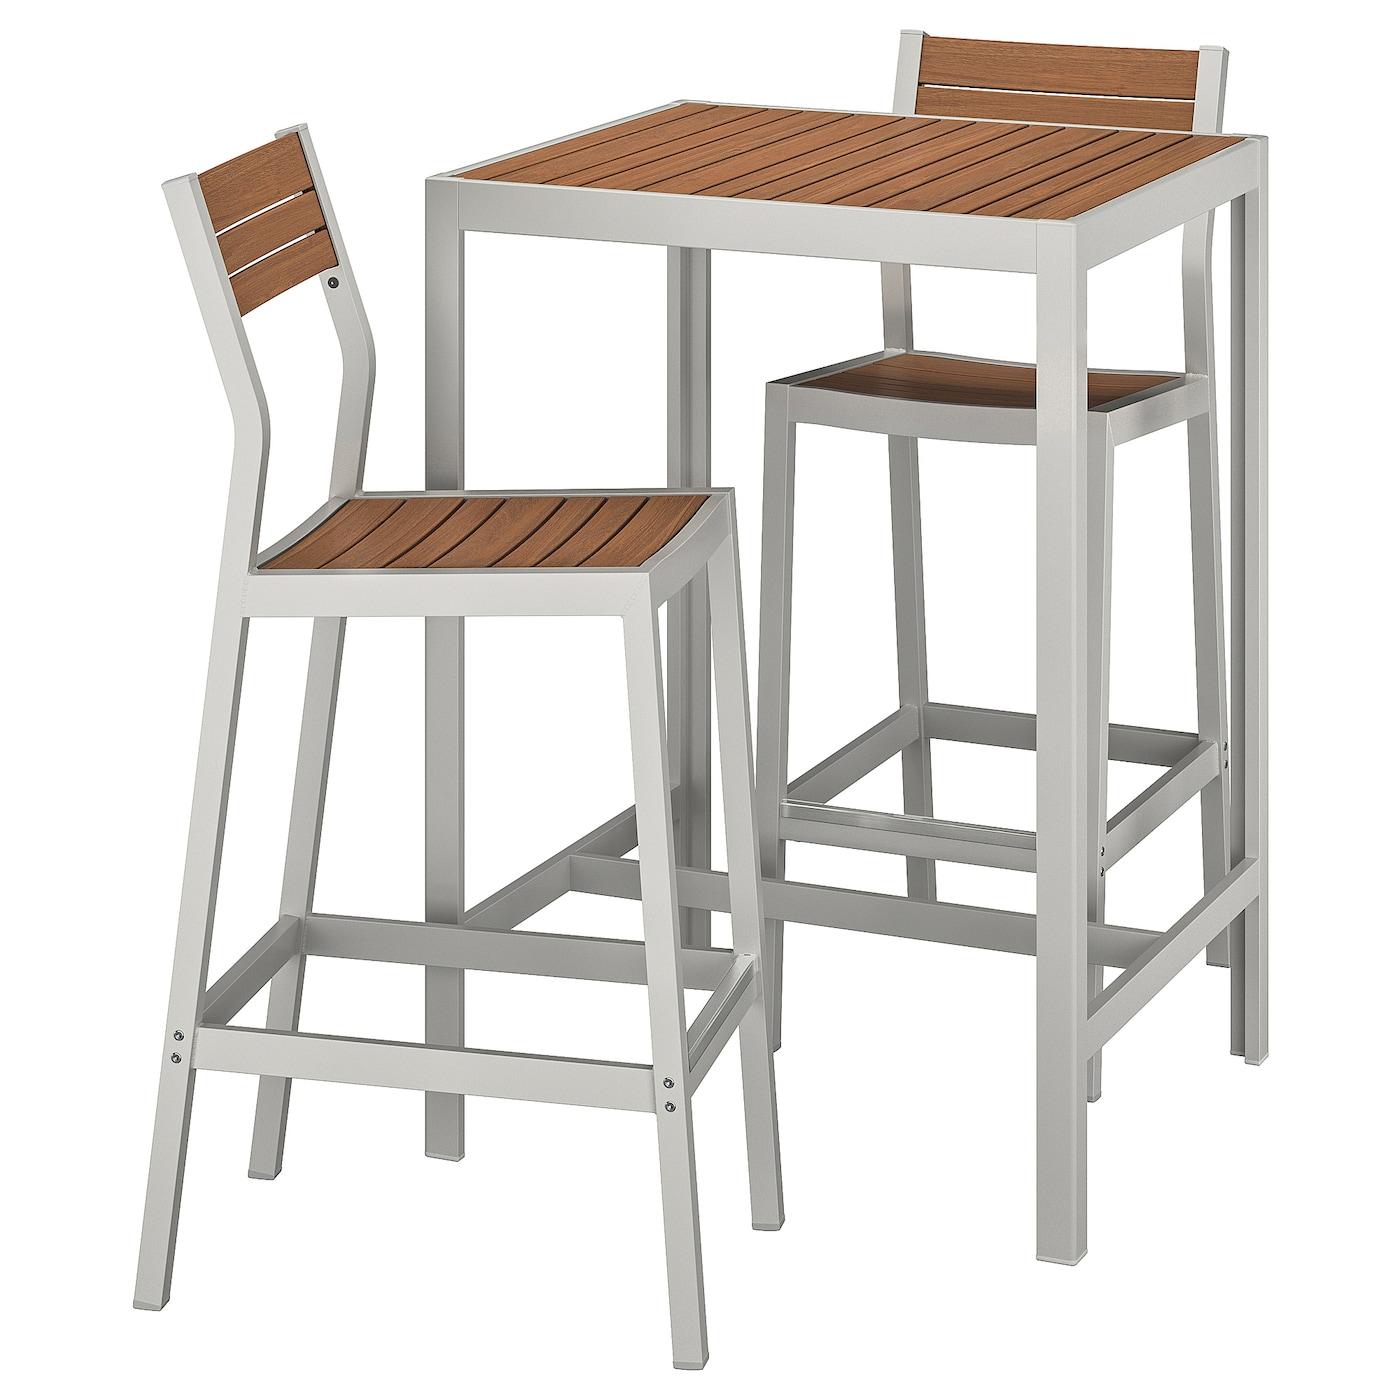 Image of: Sjalland Bar Table And 2 Bar Stools Outdoor Light Brown Light Grey Ikea